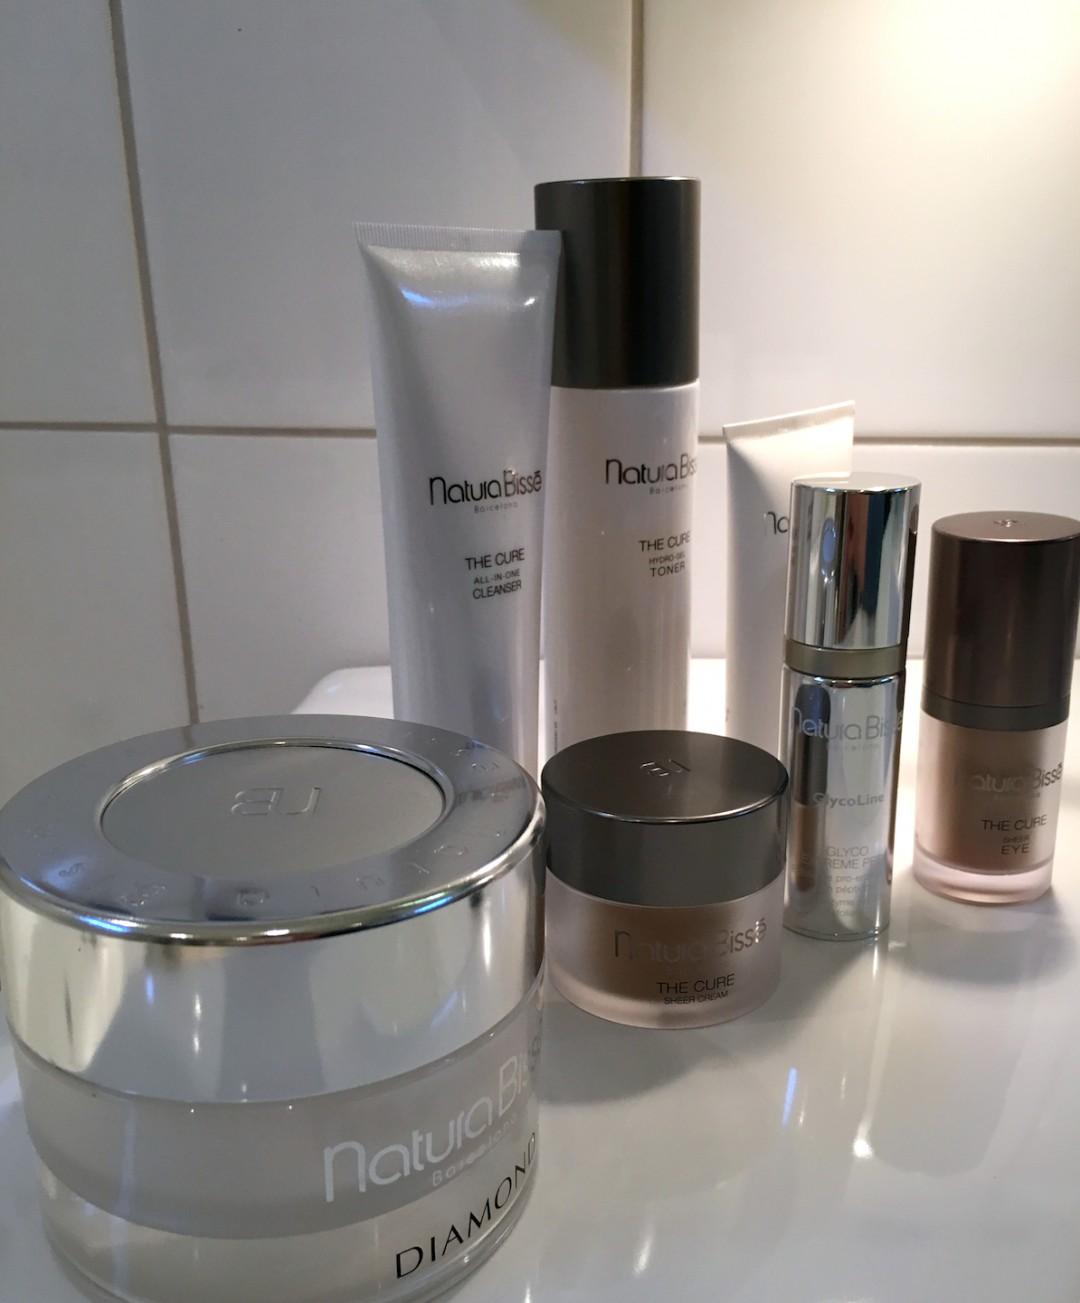 natura bisse produkter grupp|skonhetssnack.se